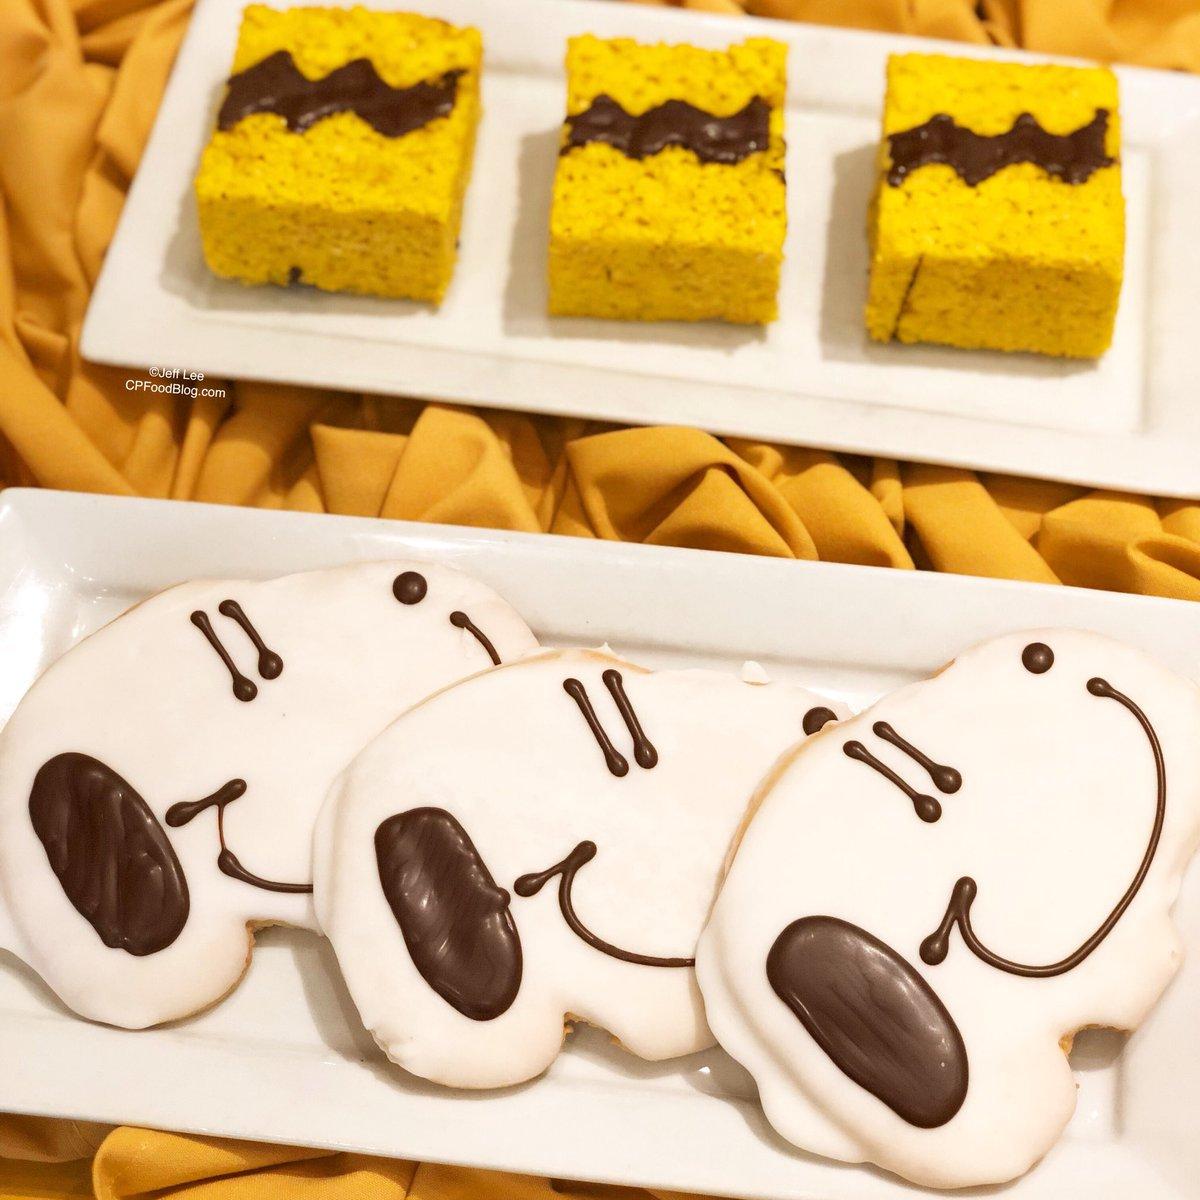 2018 Snoopy's Birthday Celebration at Knott's Berry Farm - CP Food Blog